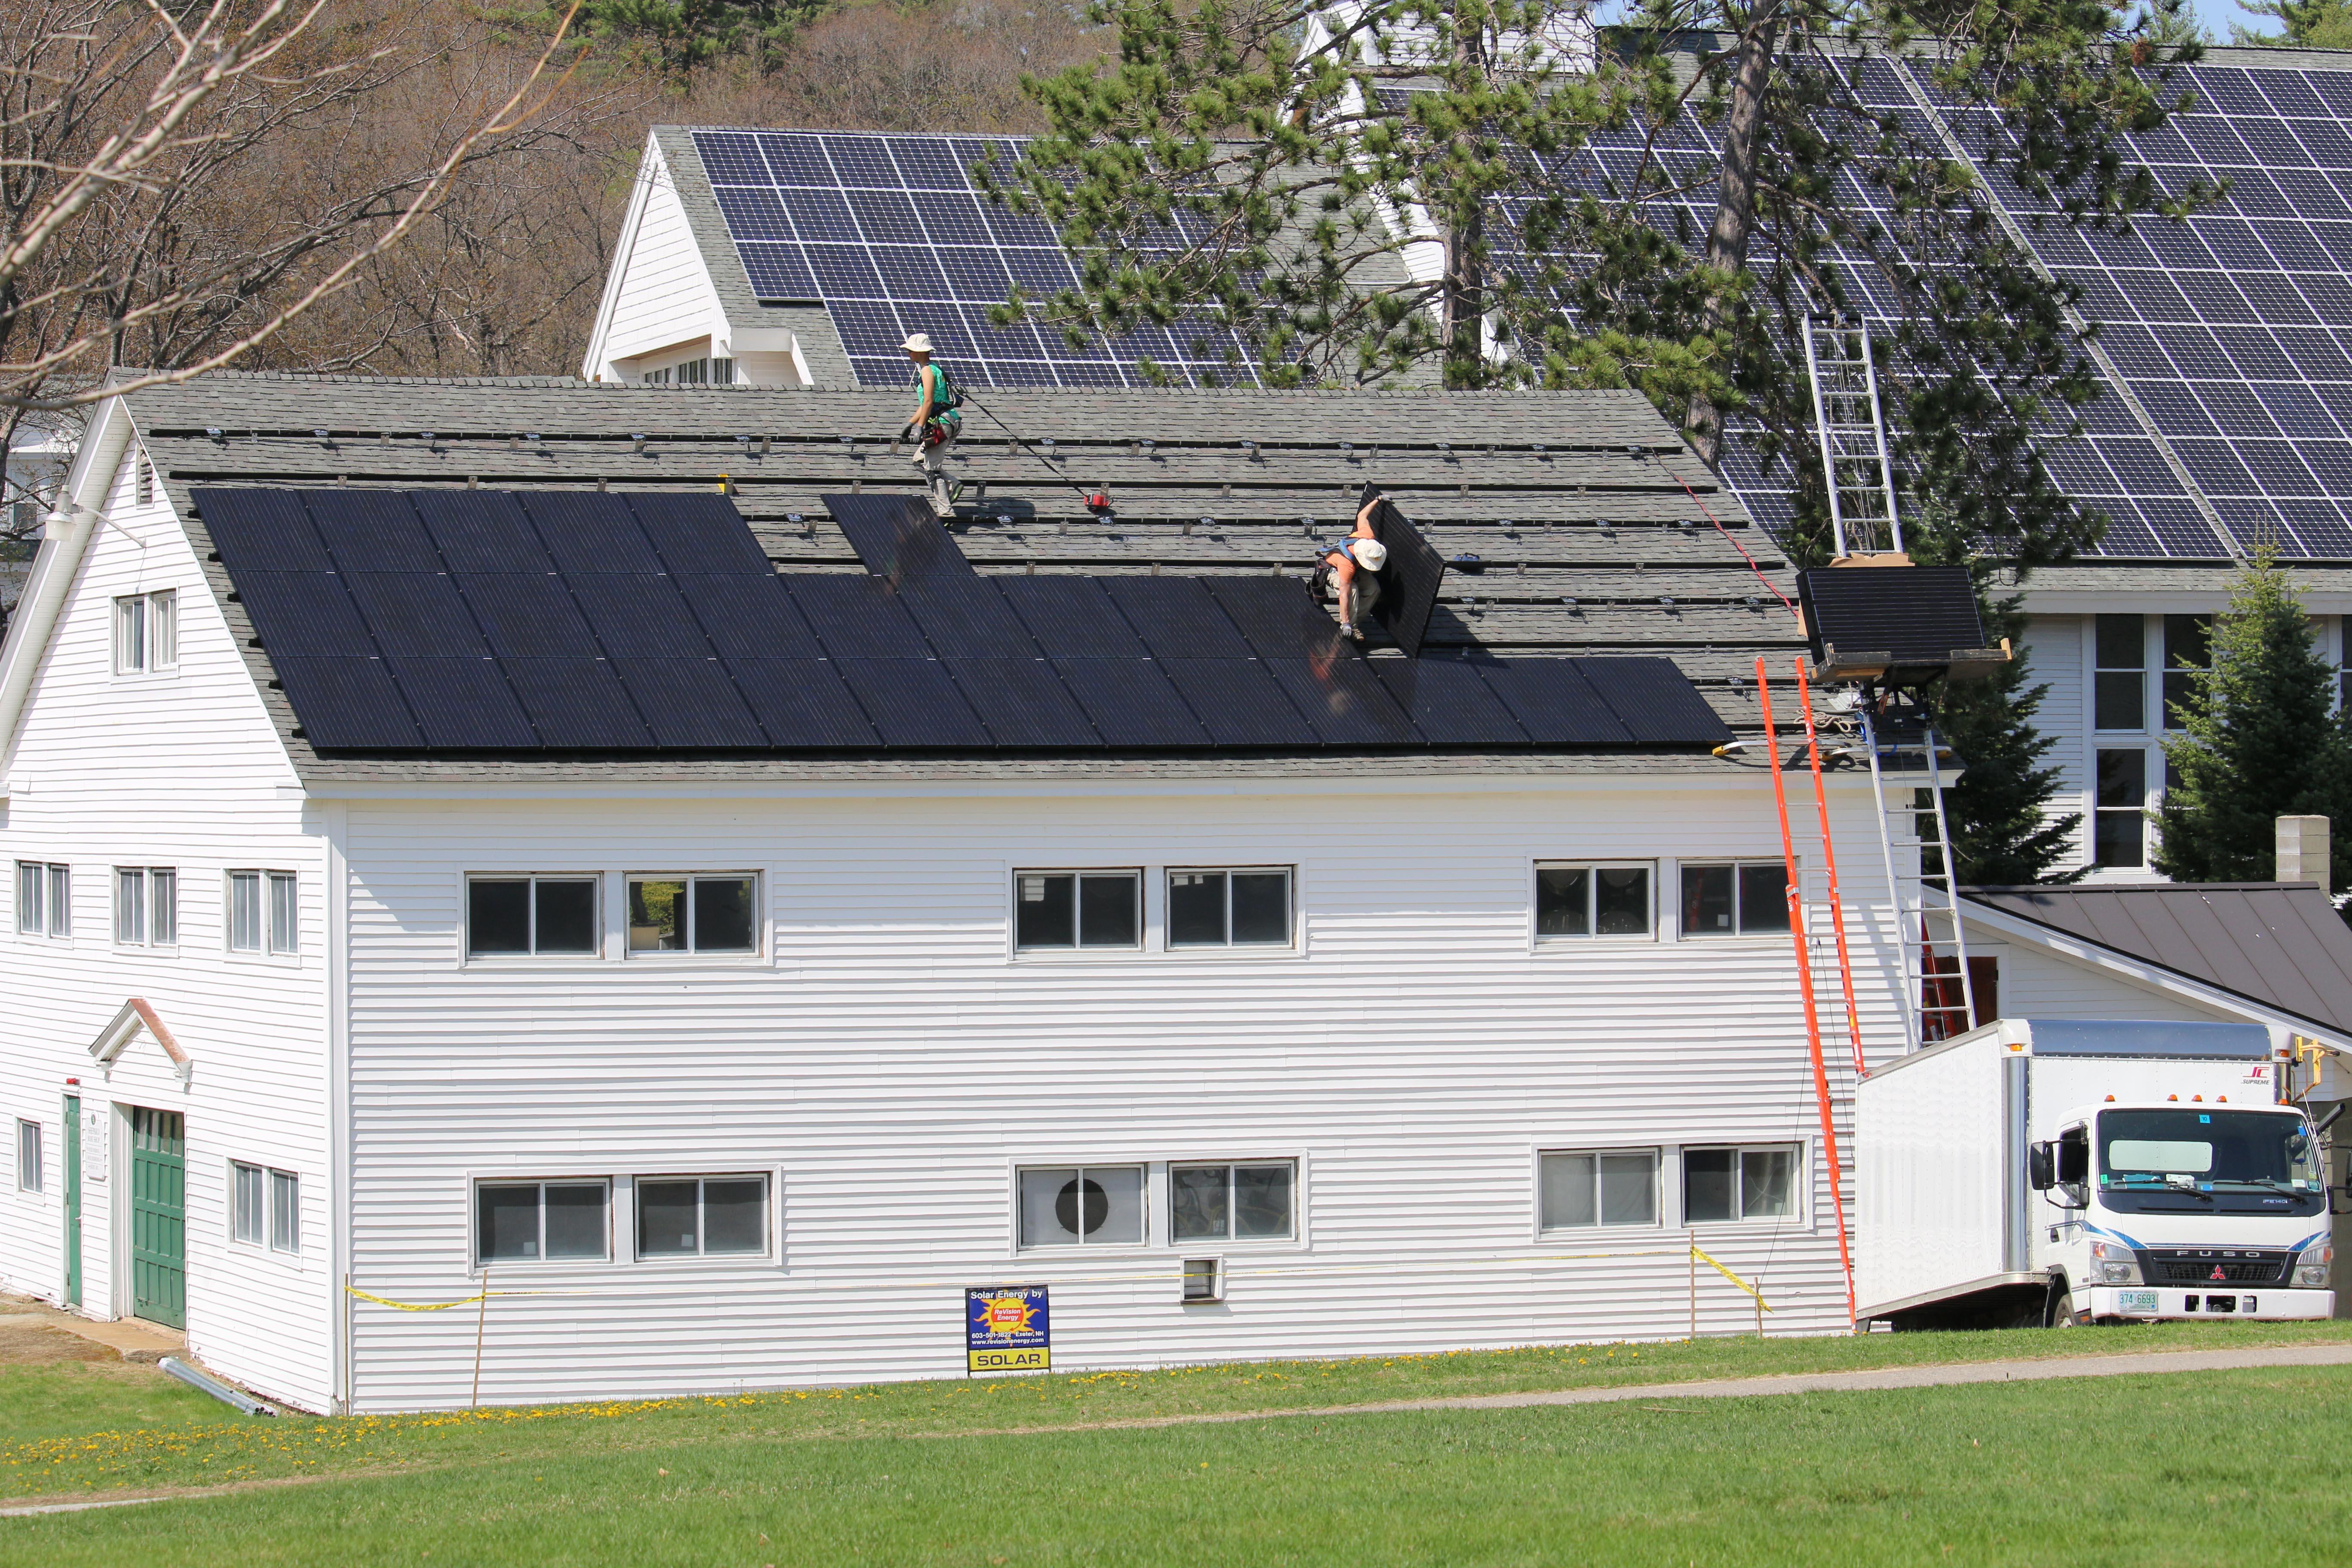 Proctor Academy Solar